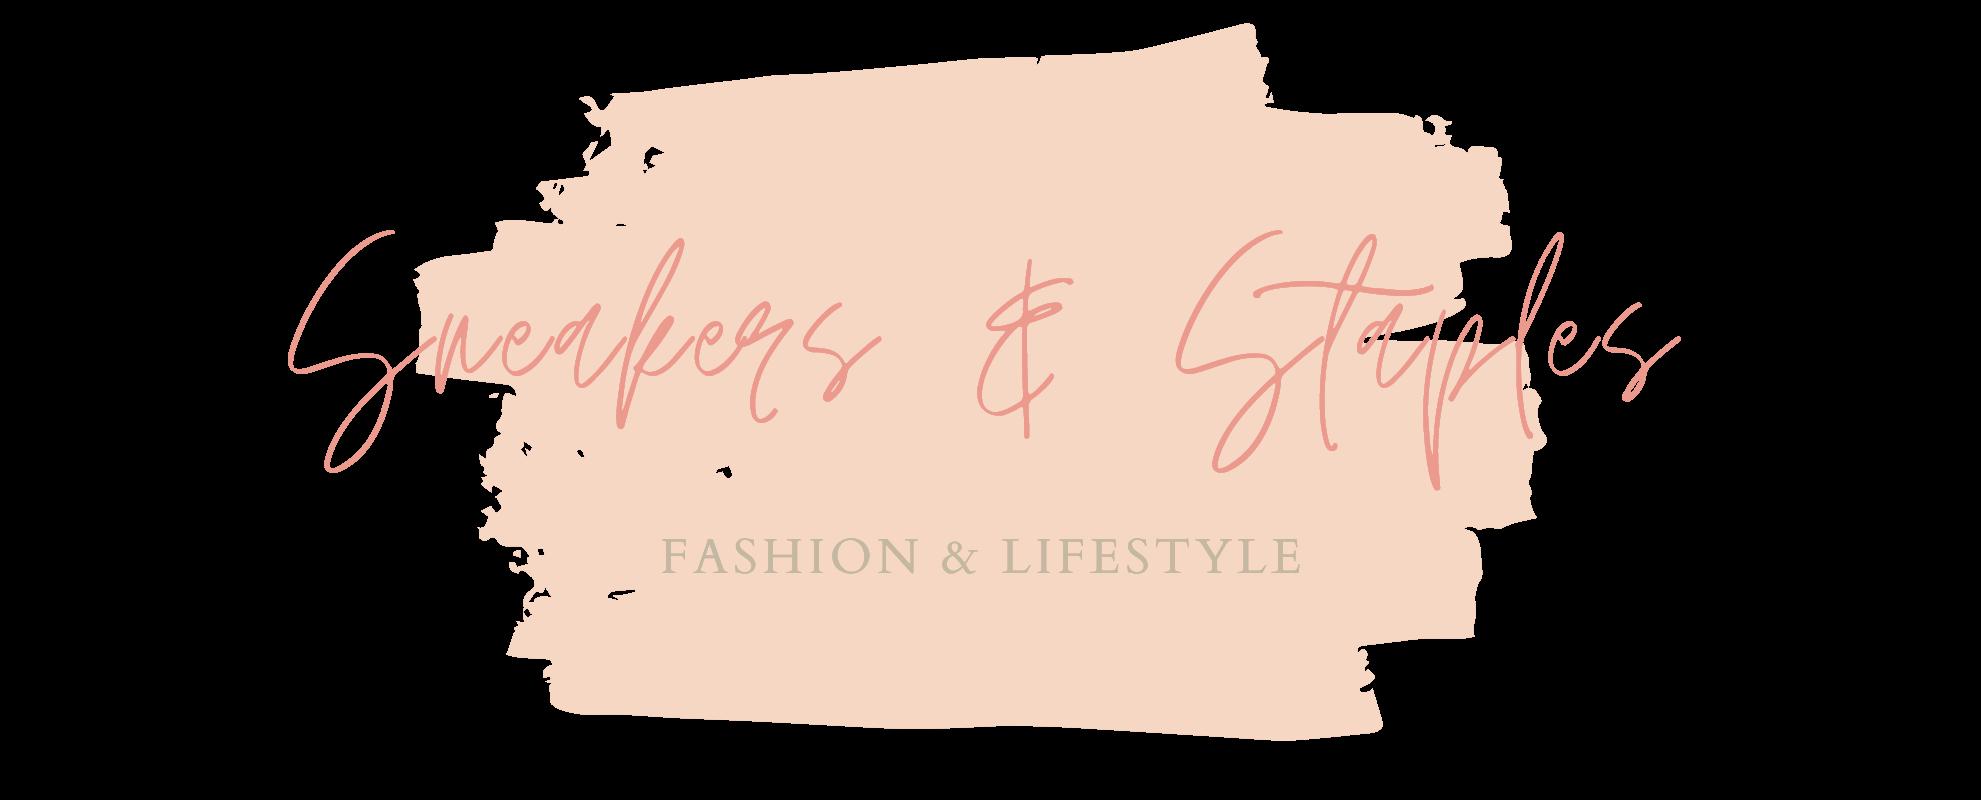 Sneakers & Staples